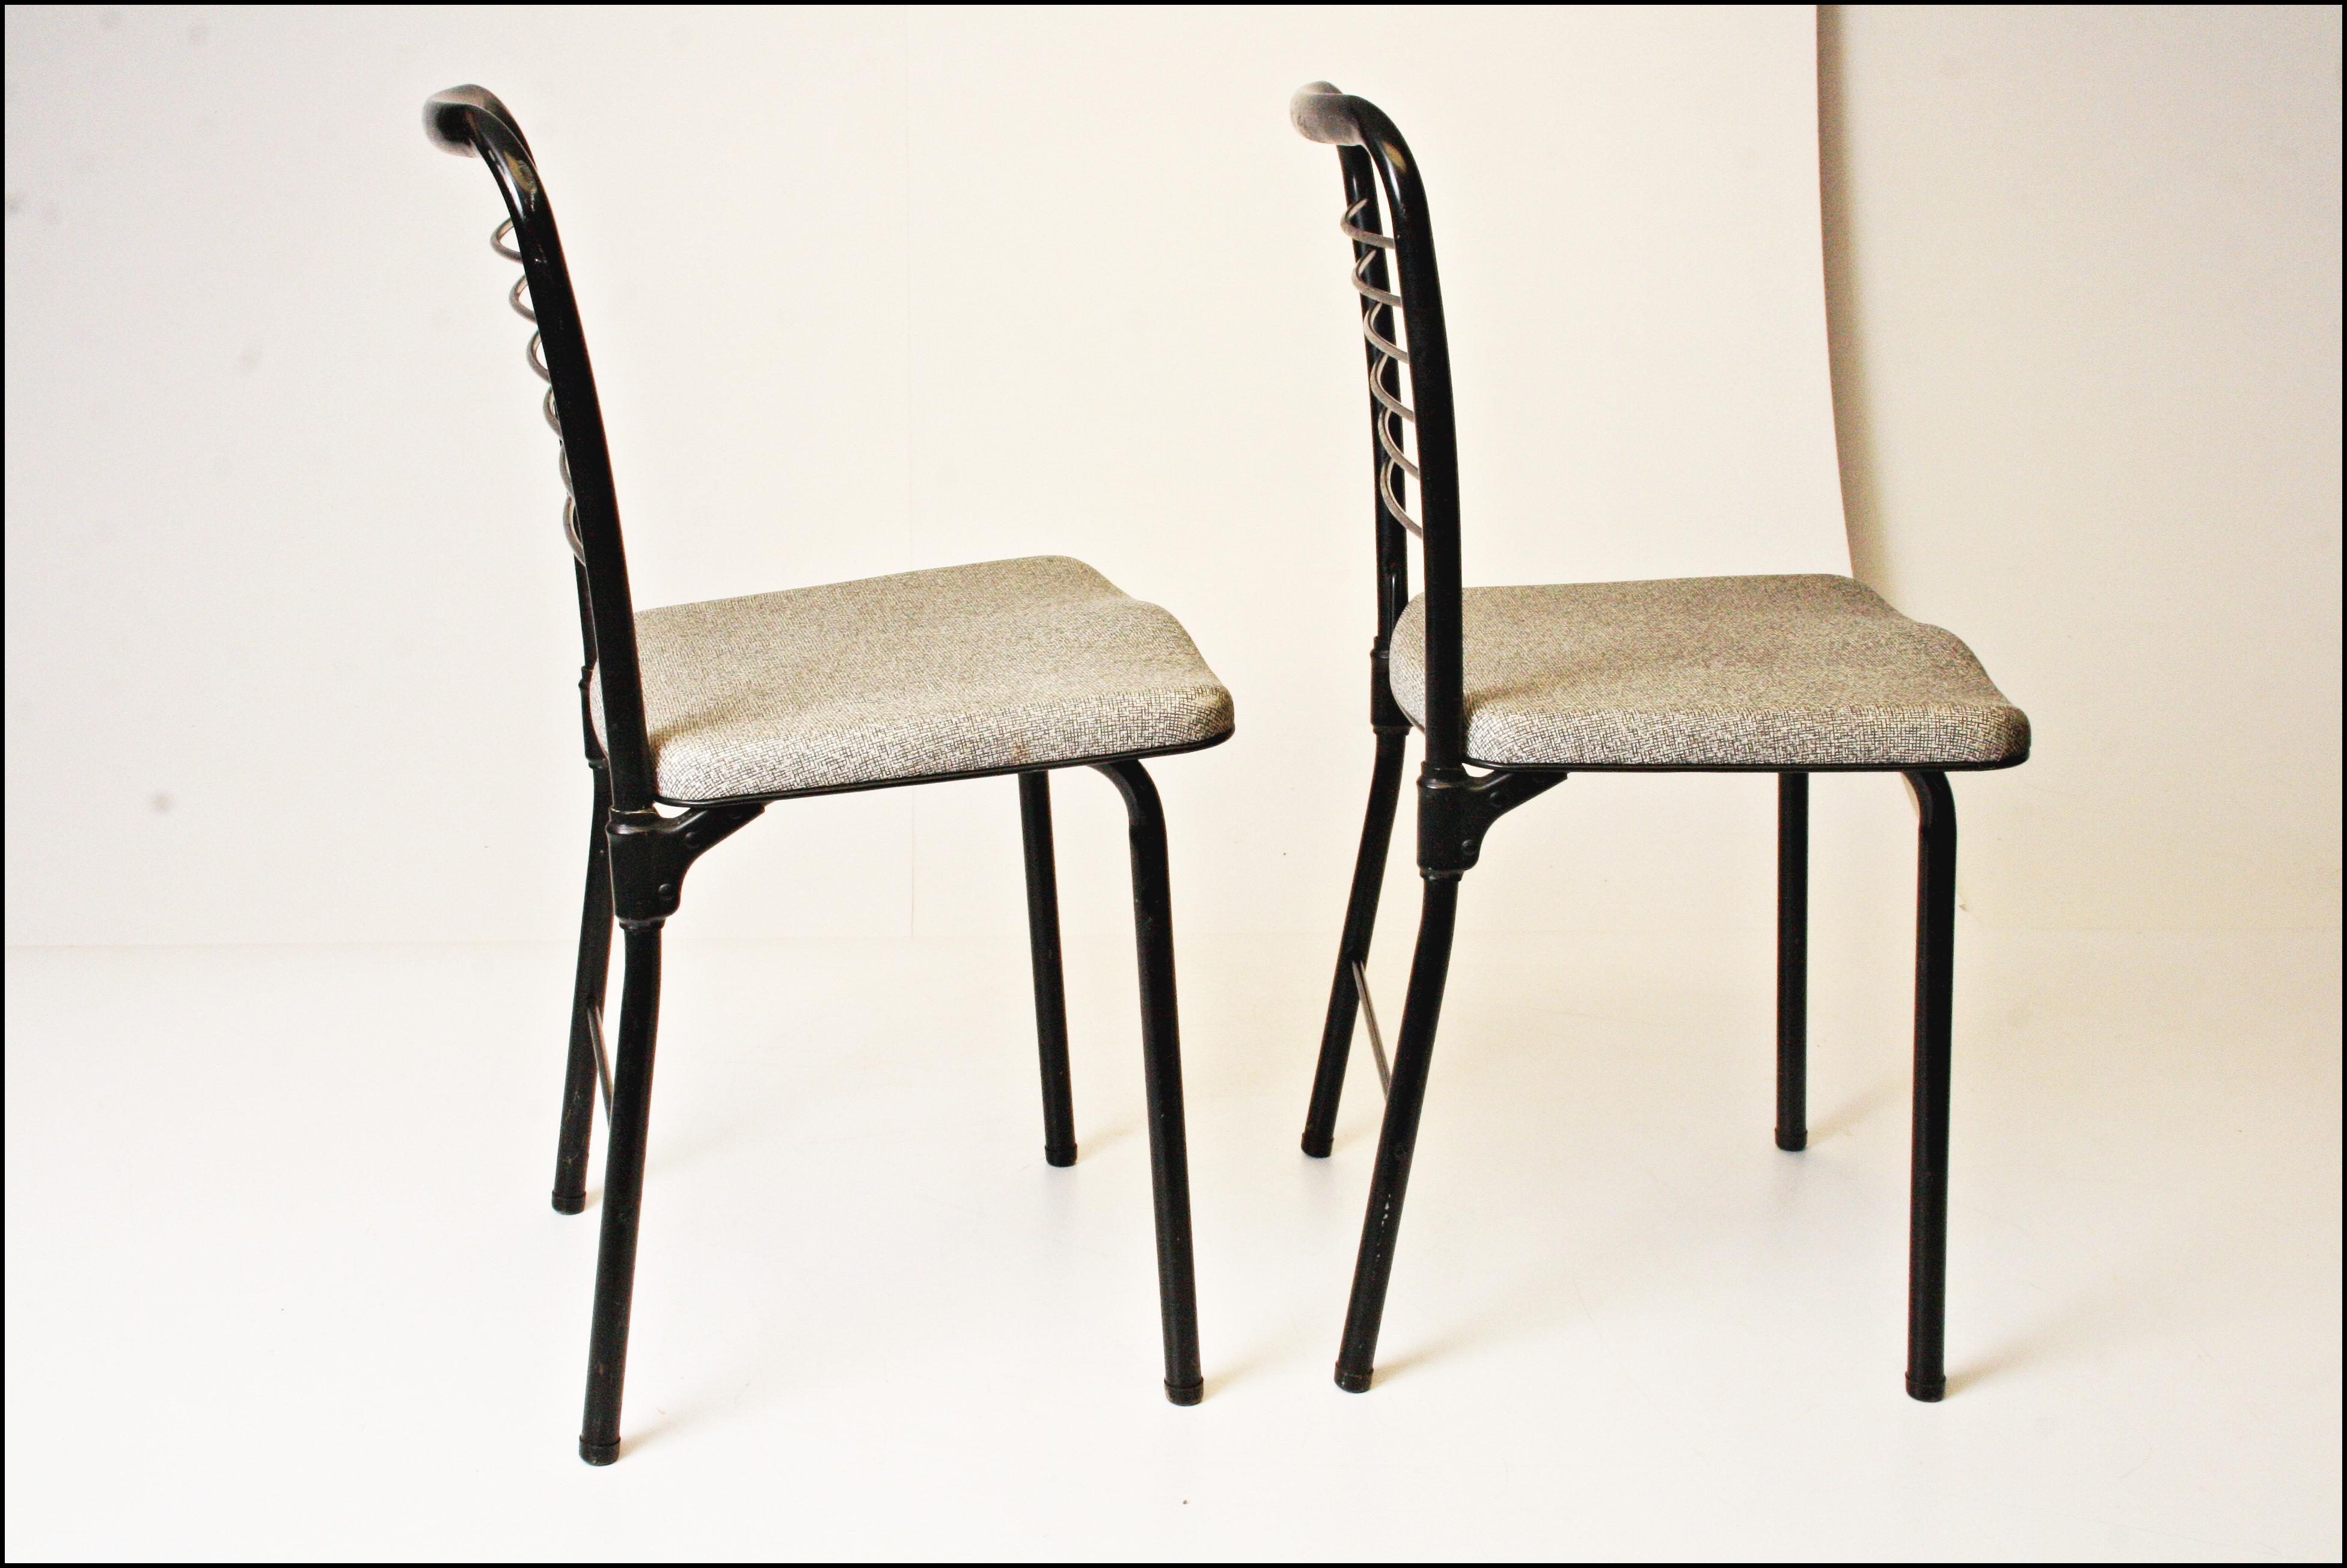 Mid Century Modern Cosco Folding Chairs Set of 4